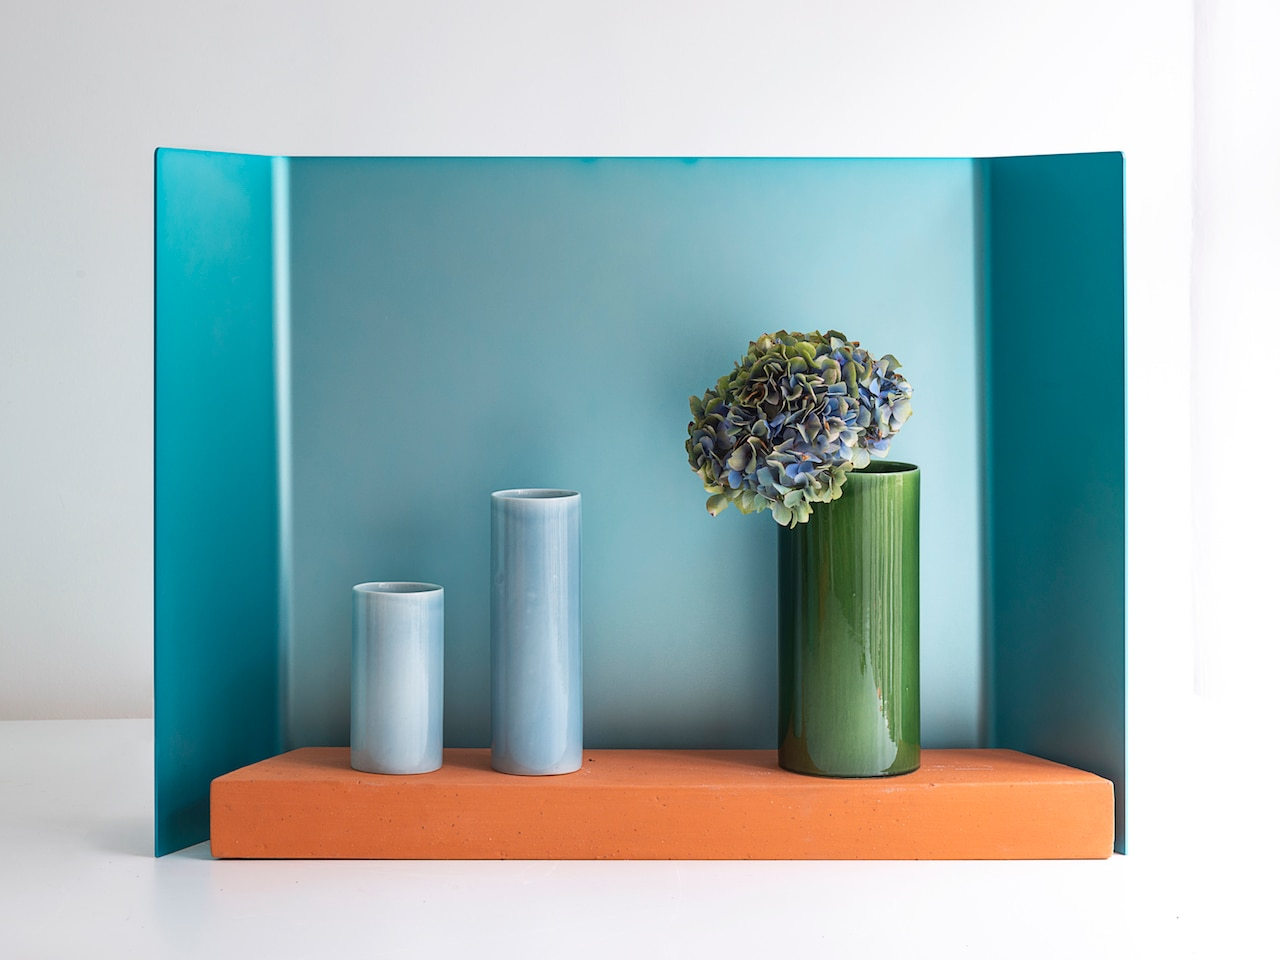 I nuovi vasi di Ronan & Erwan Bouroullec ispirati da Henri Matisse